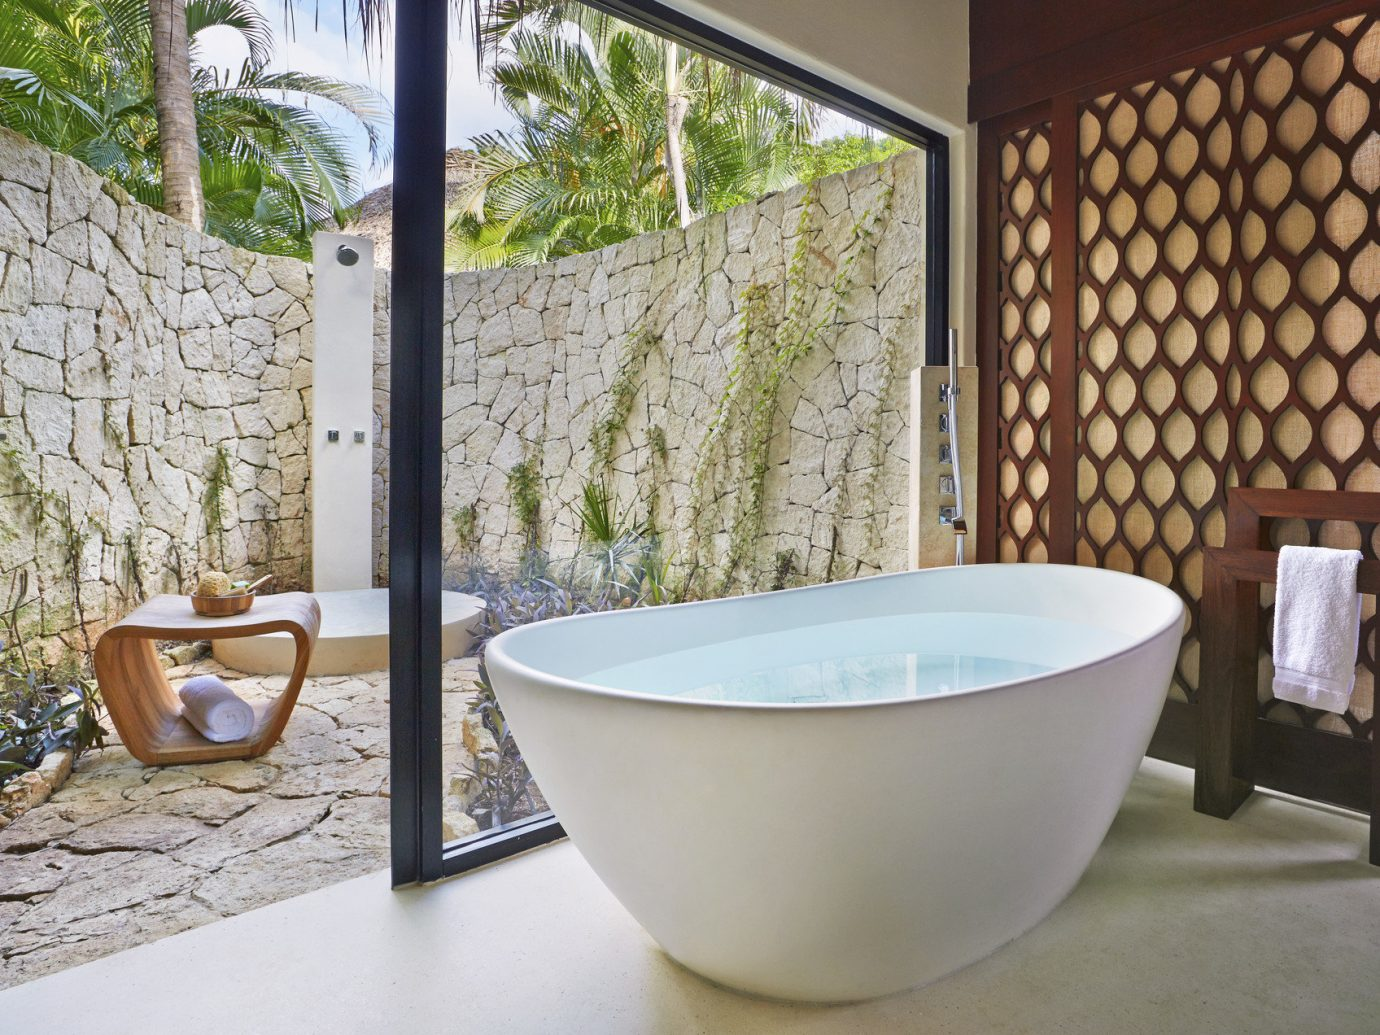 Beach Honeymoon Hotels Mexico Romance Tulum room property bathtub bathroom swimming pool plumbing fixture floor interior design bidet estate flooring jacuzzi stone